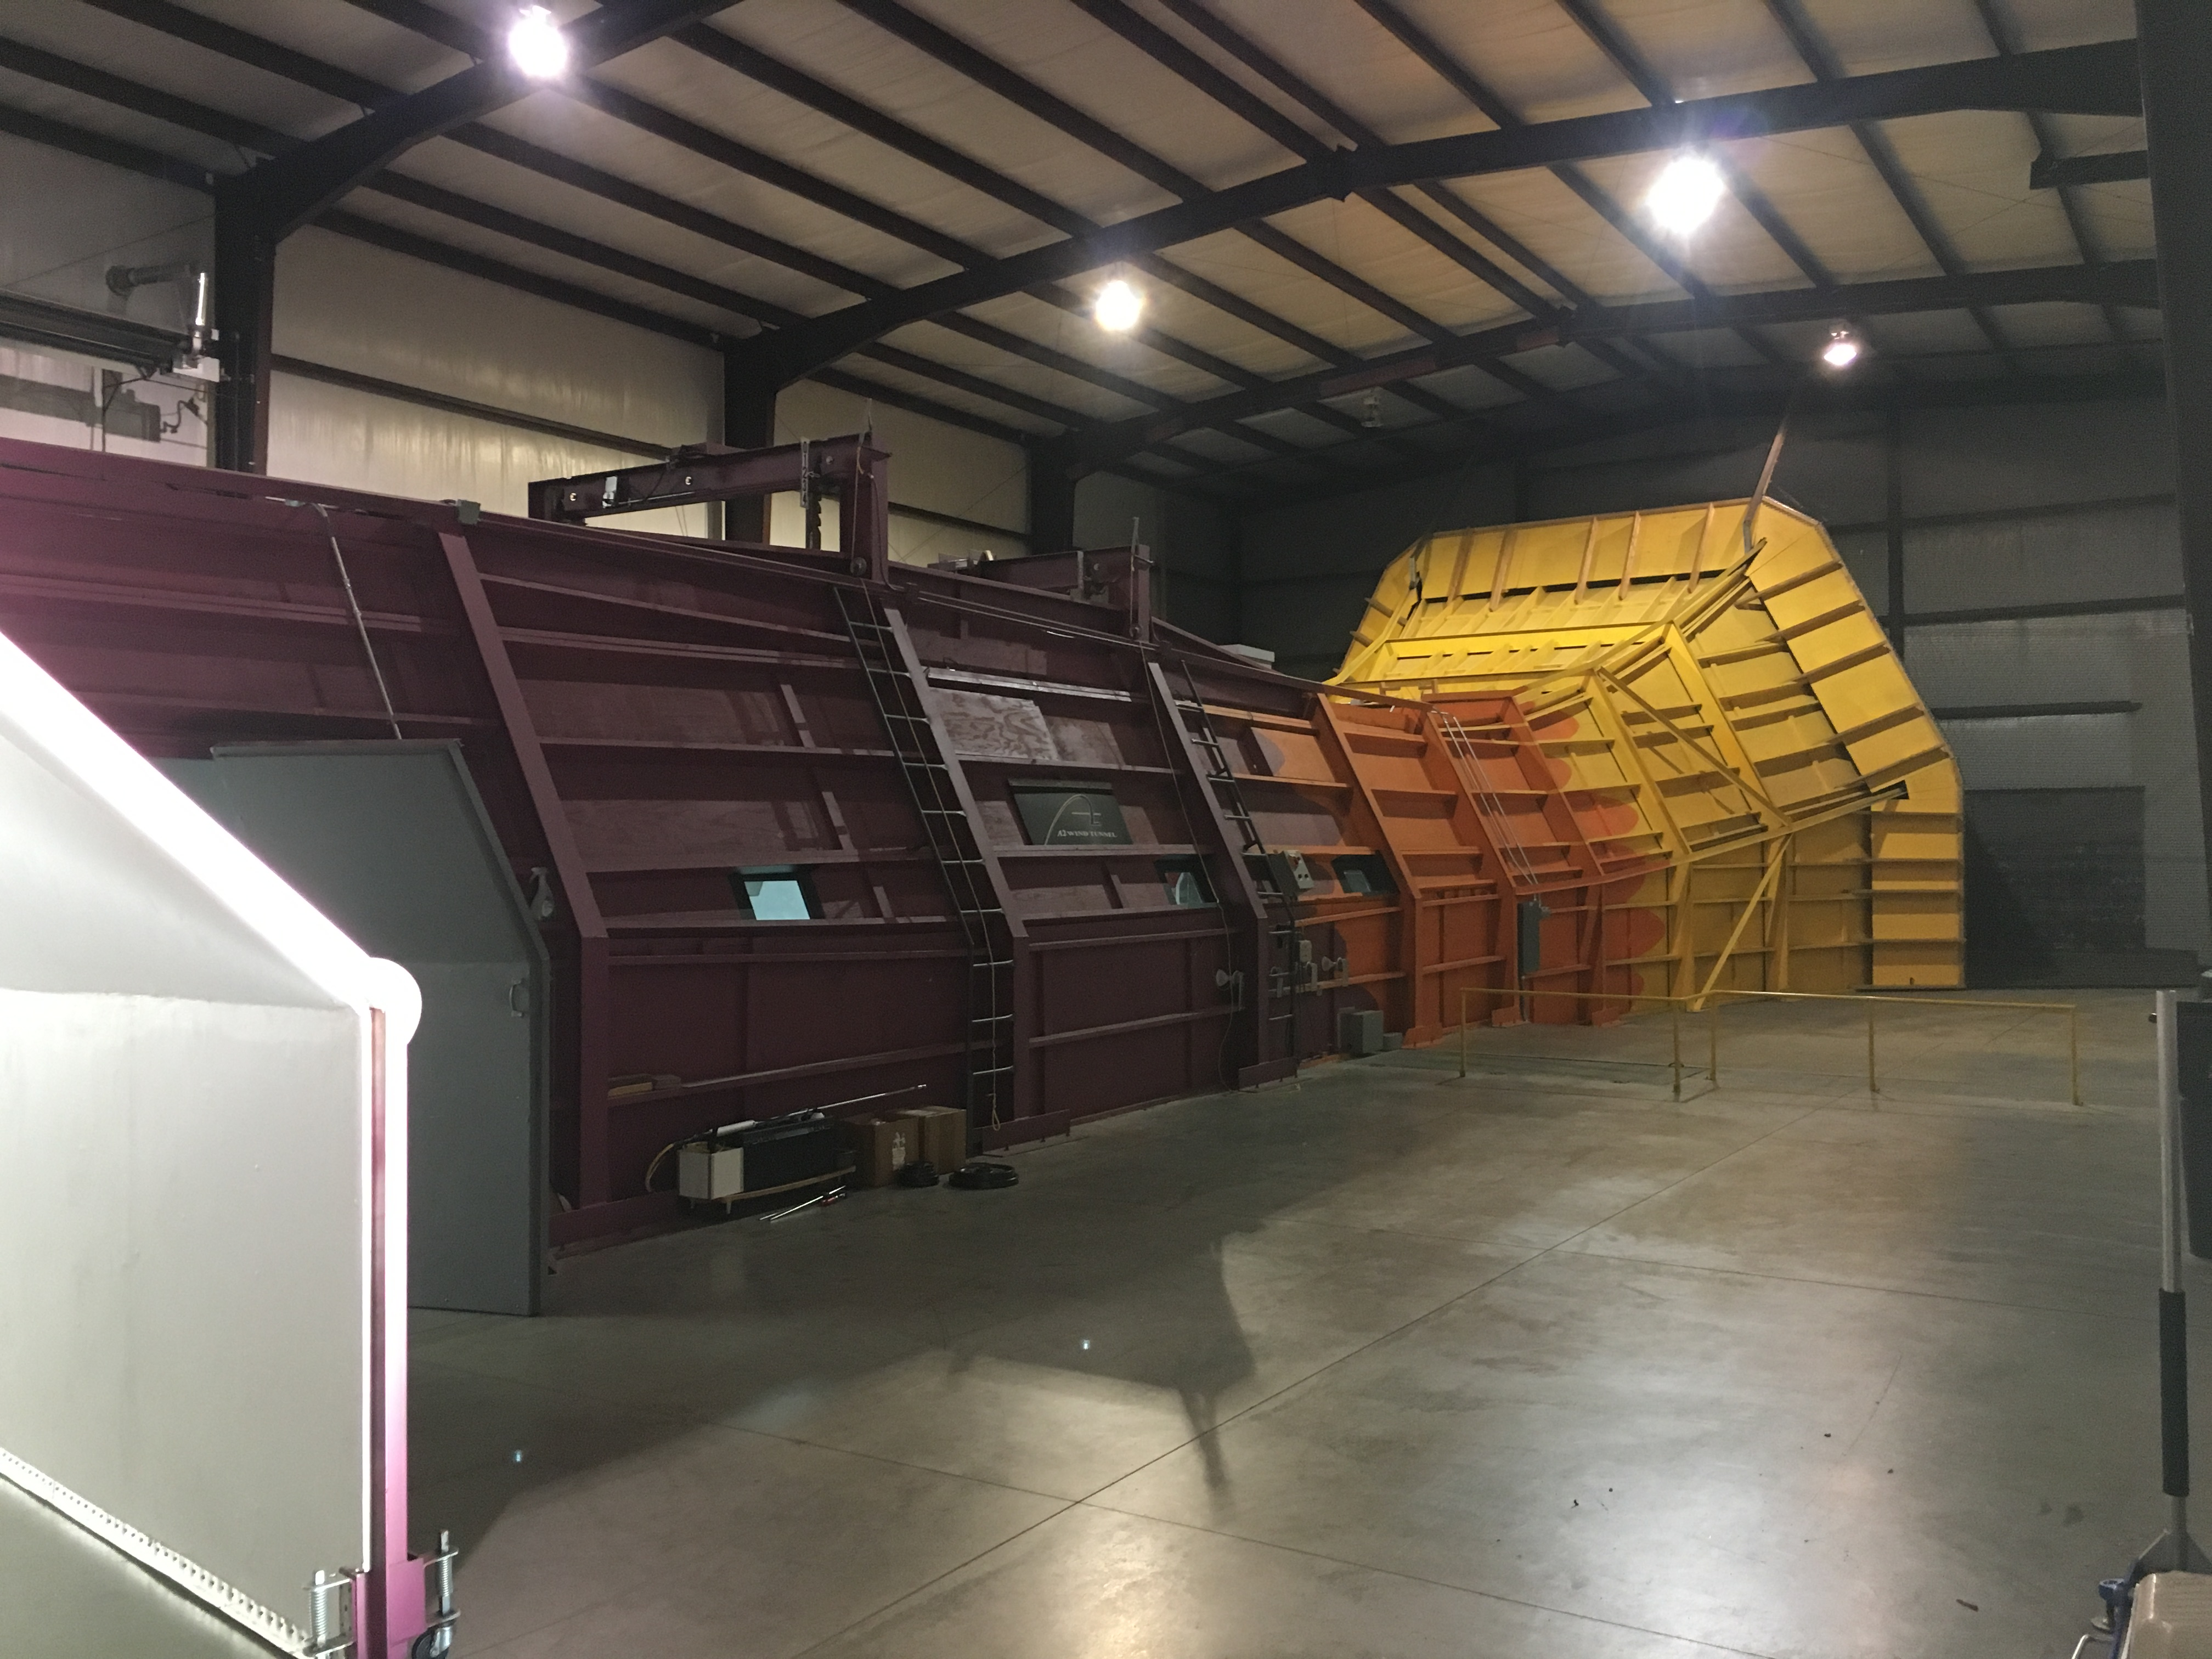 race-louvers-wind-tunnel-facility.jpg